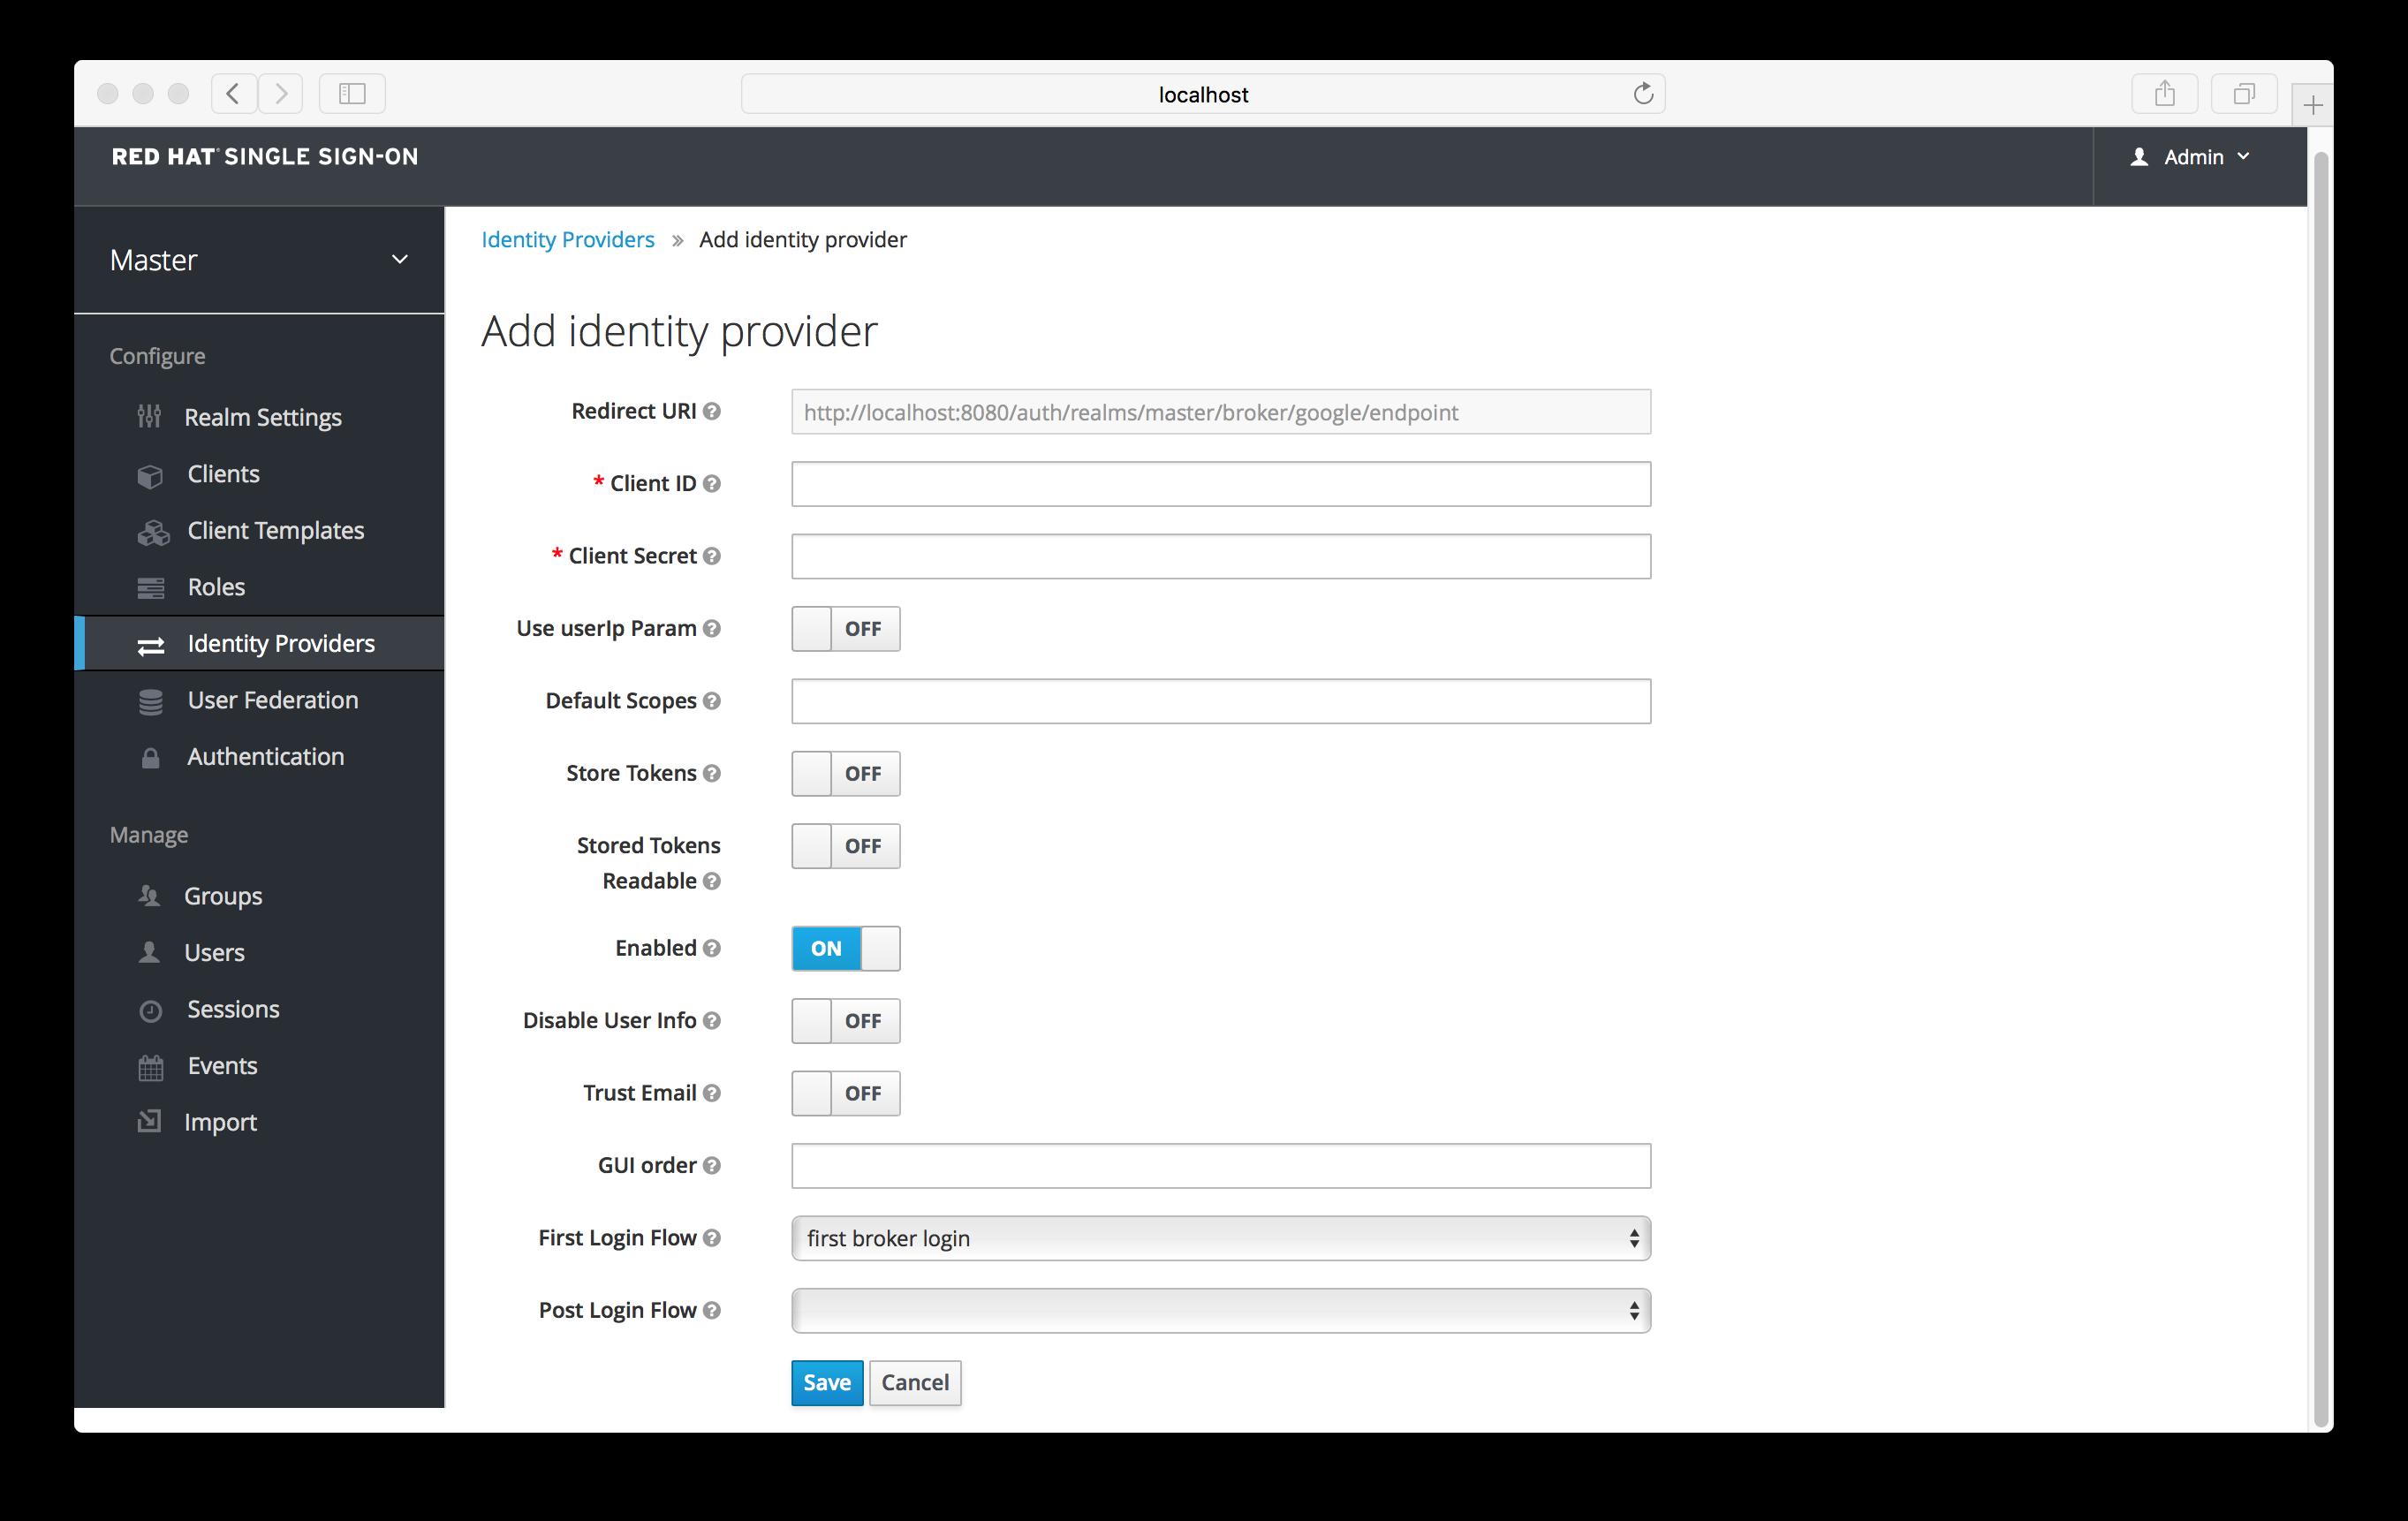 add identity provider